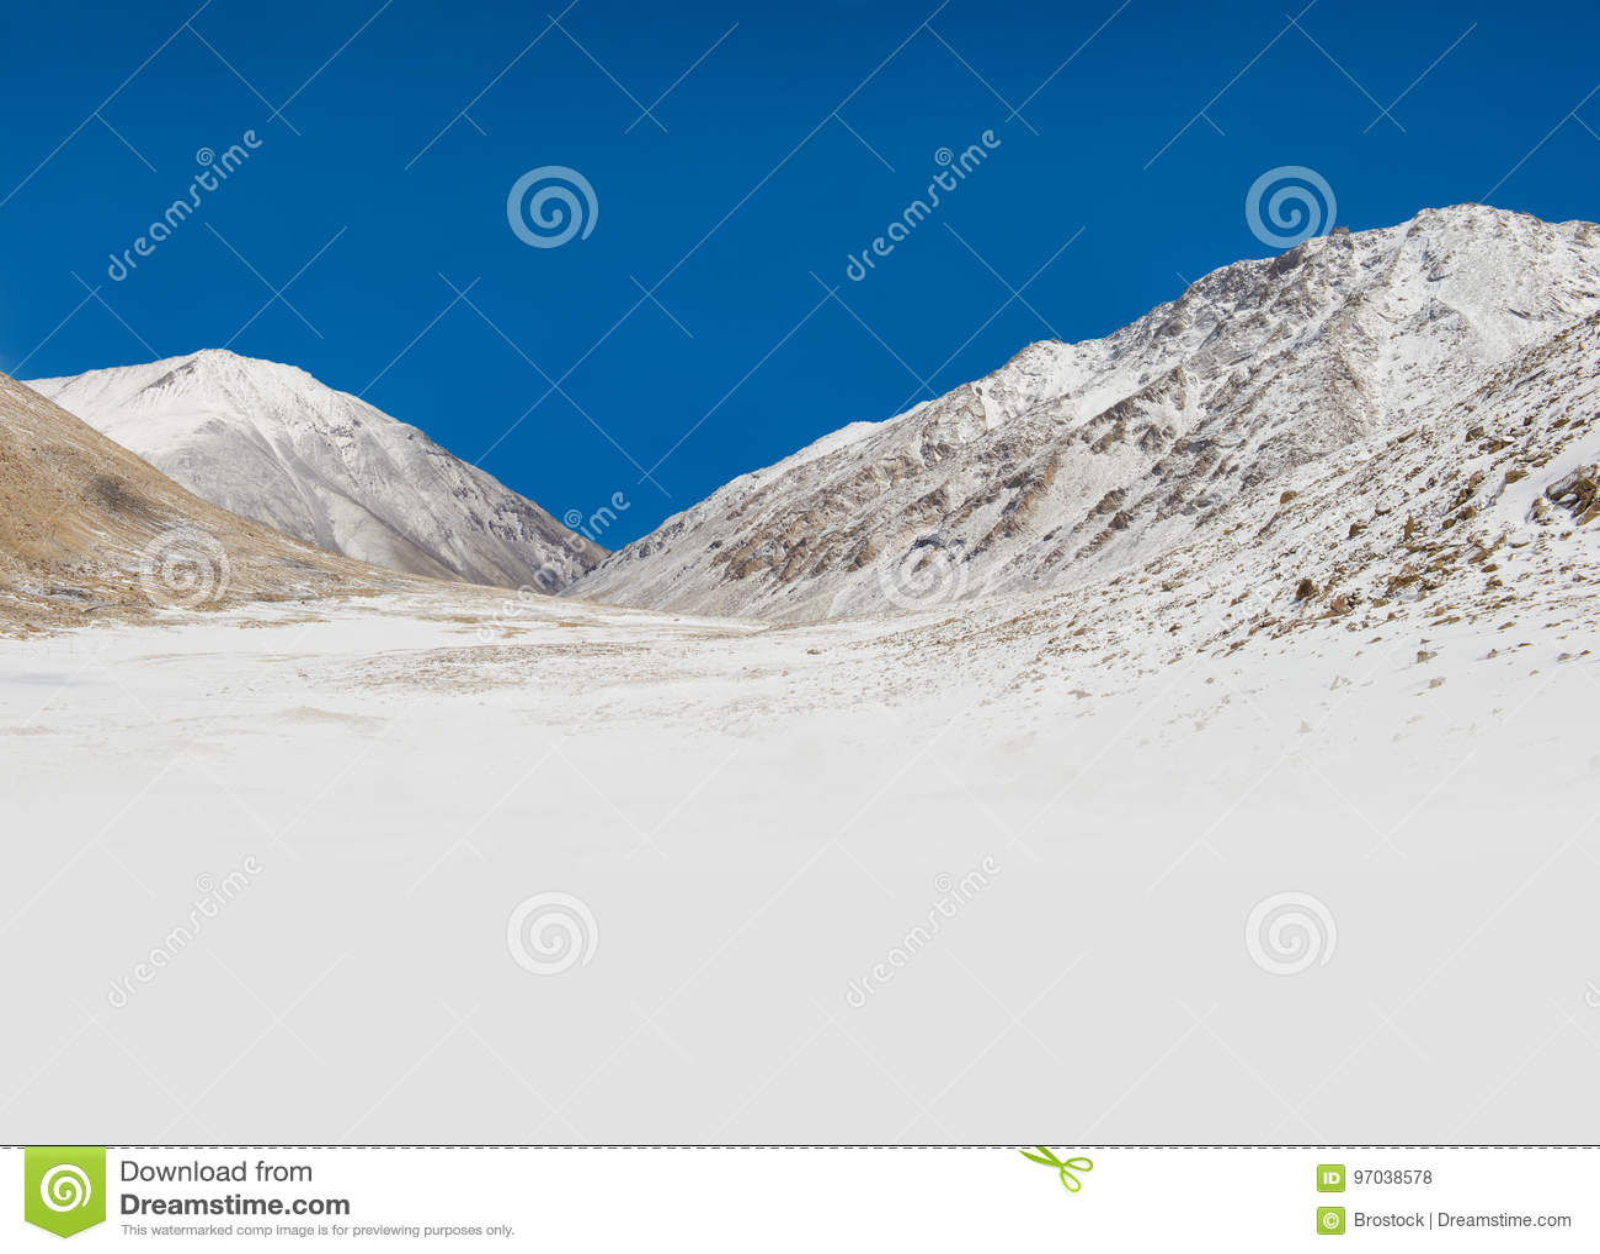 Paisaje hermoso de la montaña con nieve